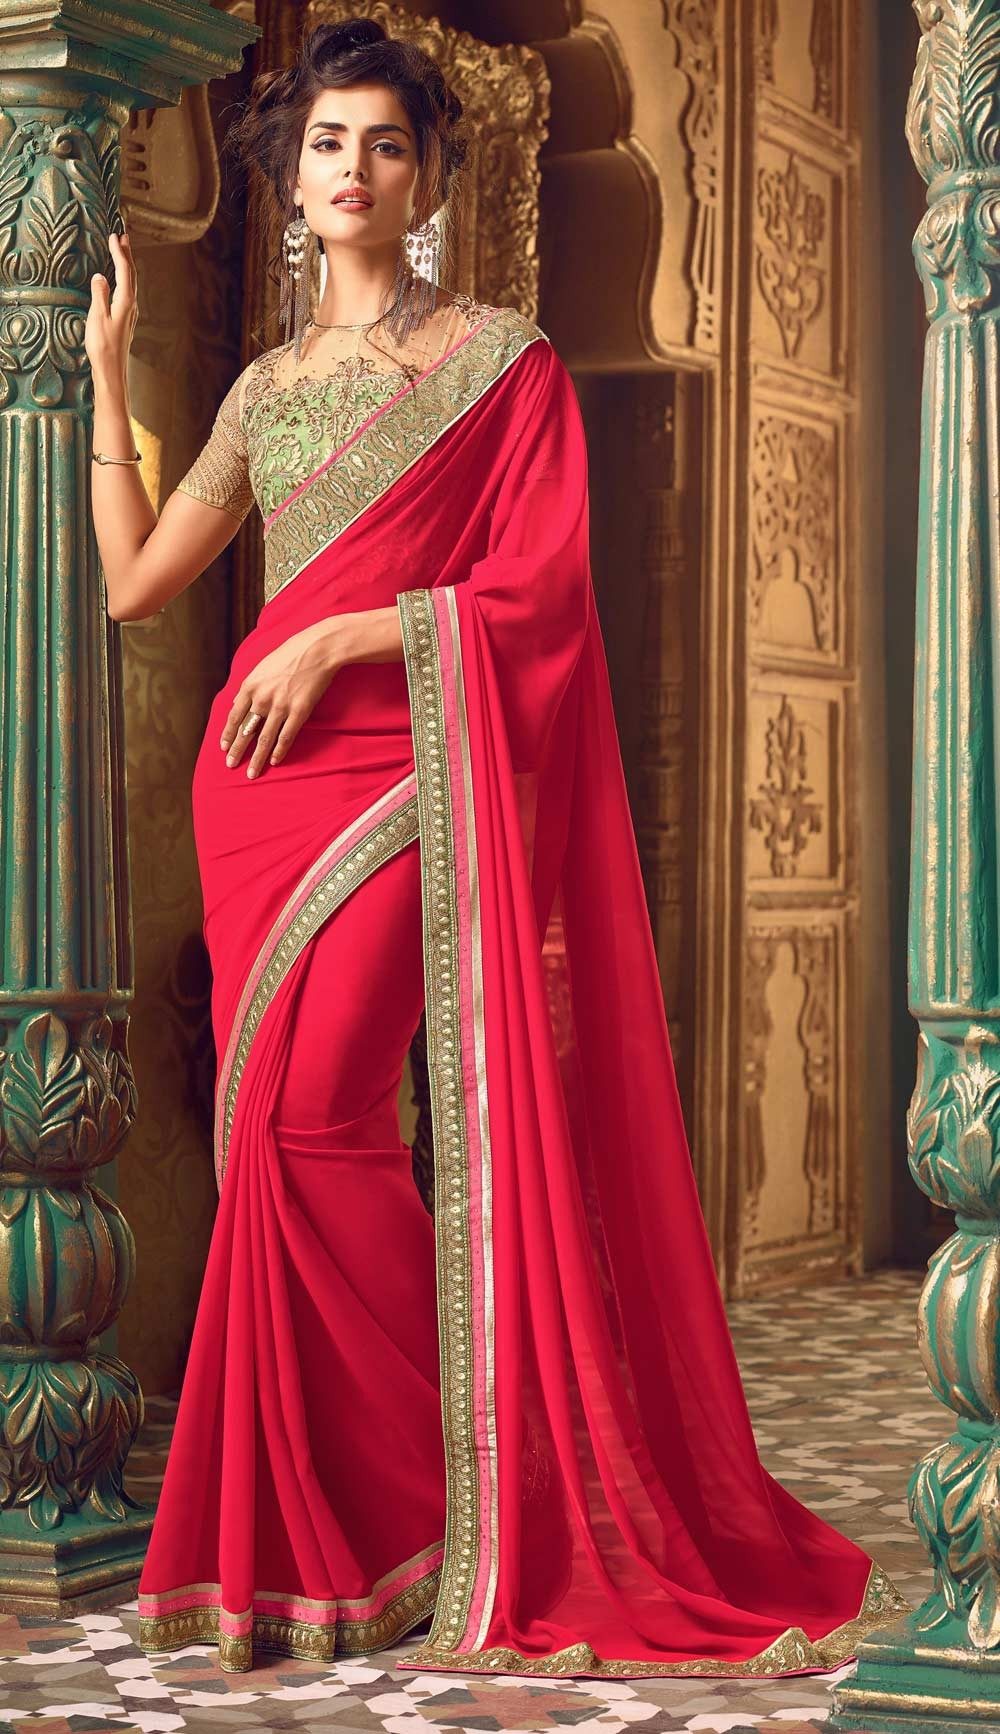 14f84d85f00446 Latest Pakistani Designer Saree Designs 2019 For Women - StyleGlow.com